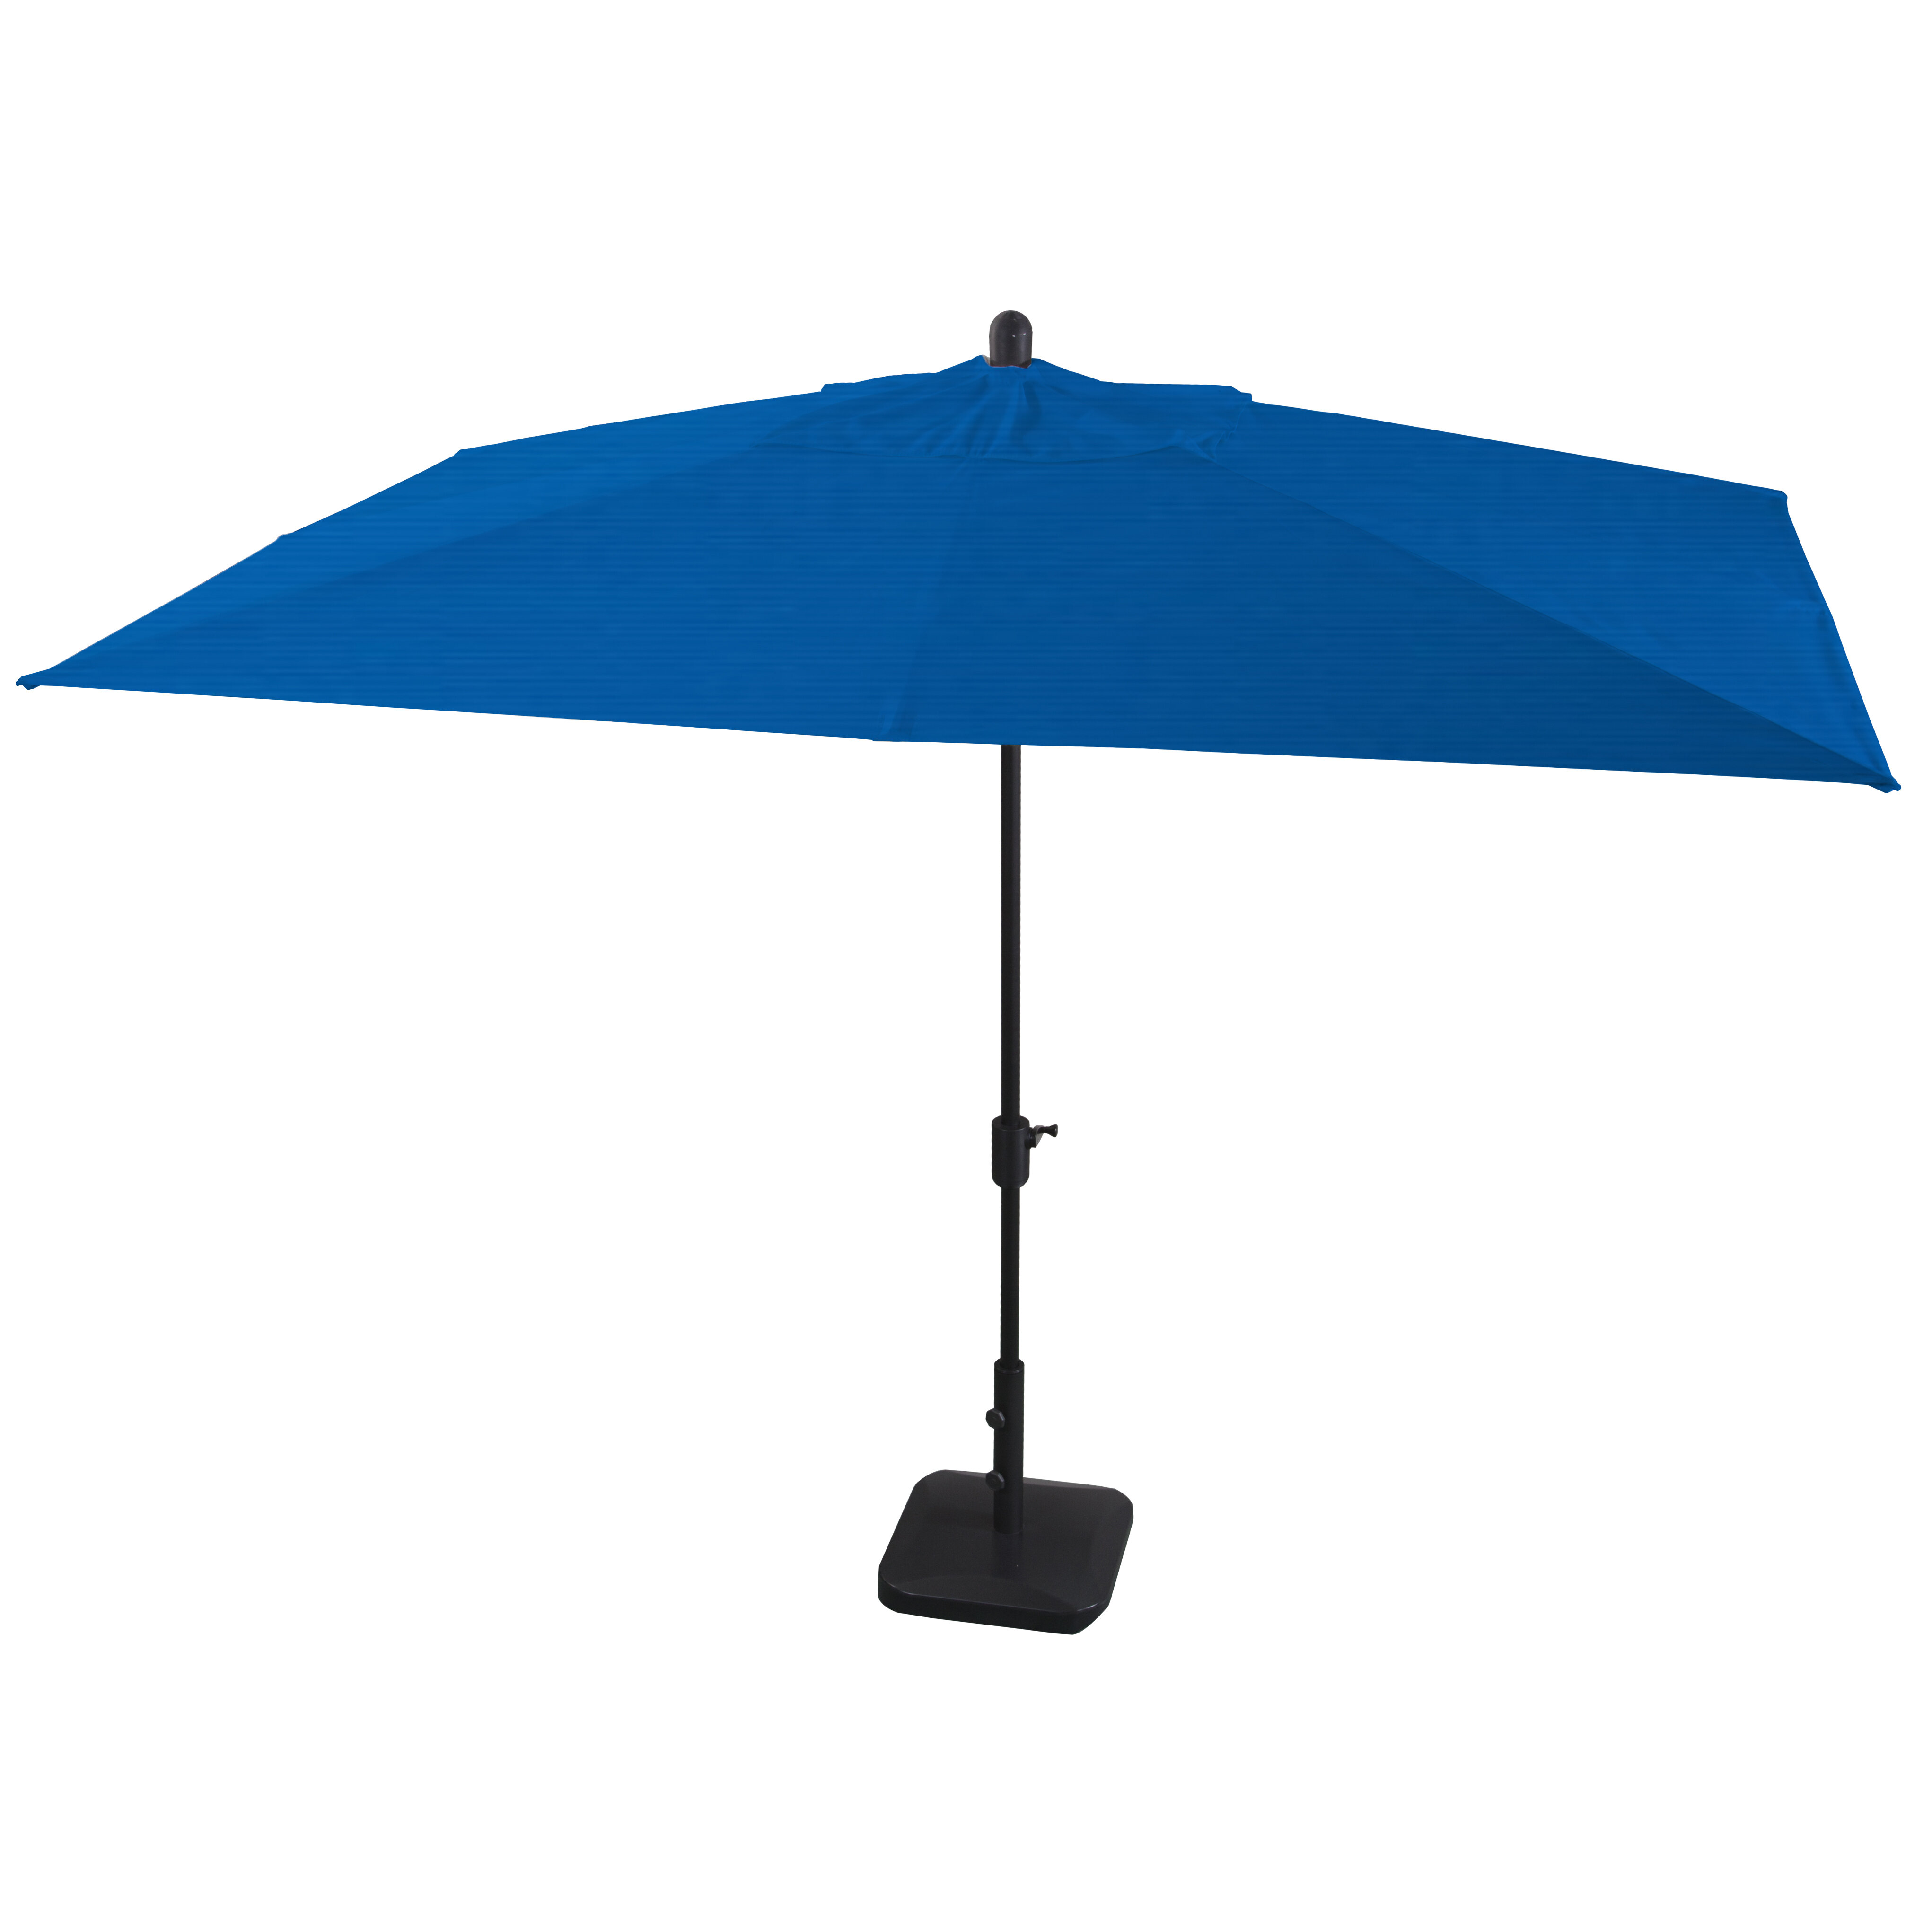 Breakwater Bay Wieczorek 118 X 78 Rectangular Market Sunbrella Umbrella Reviews Wayfair